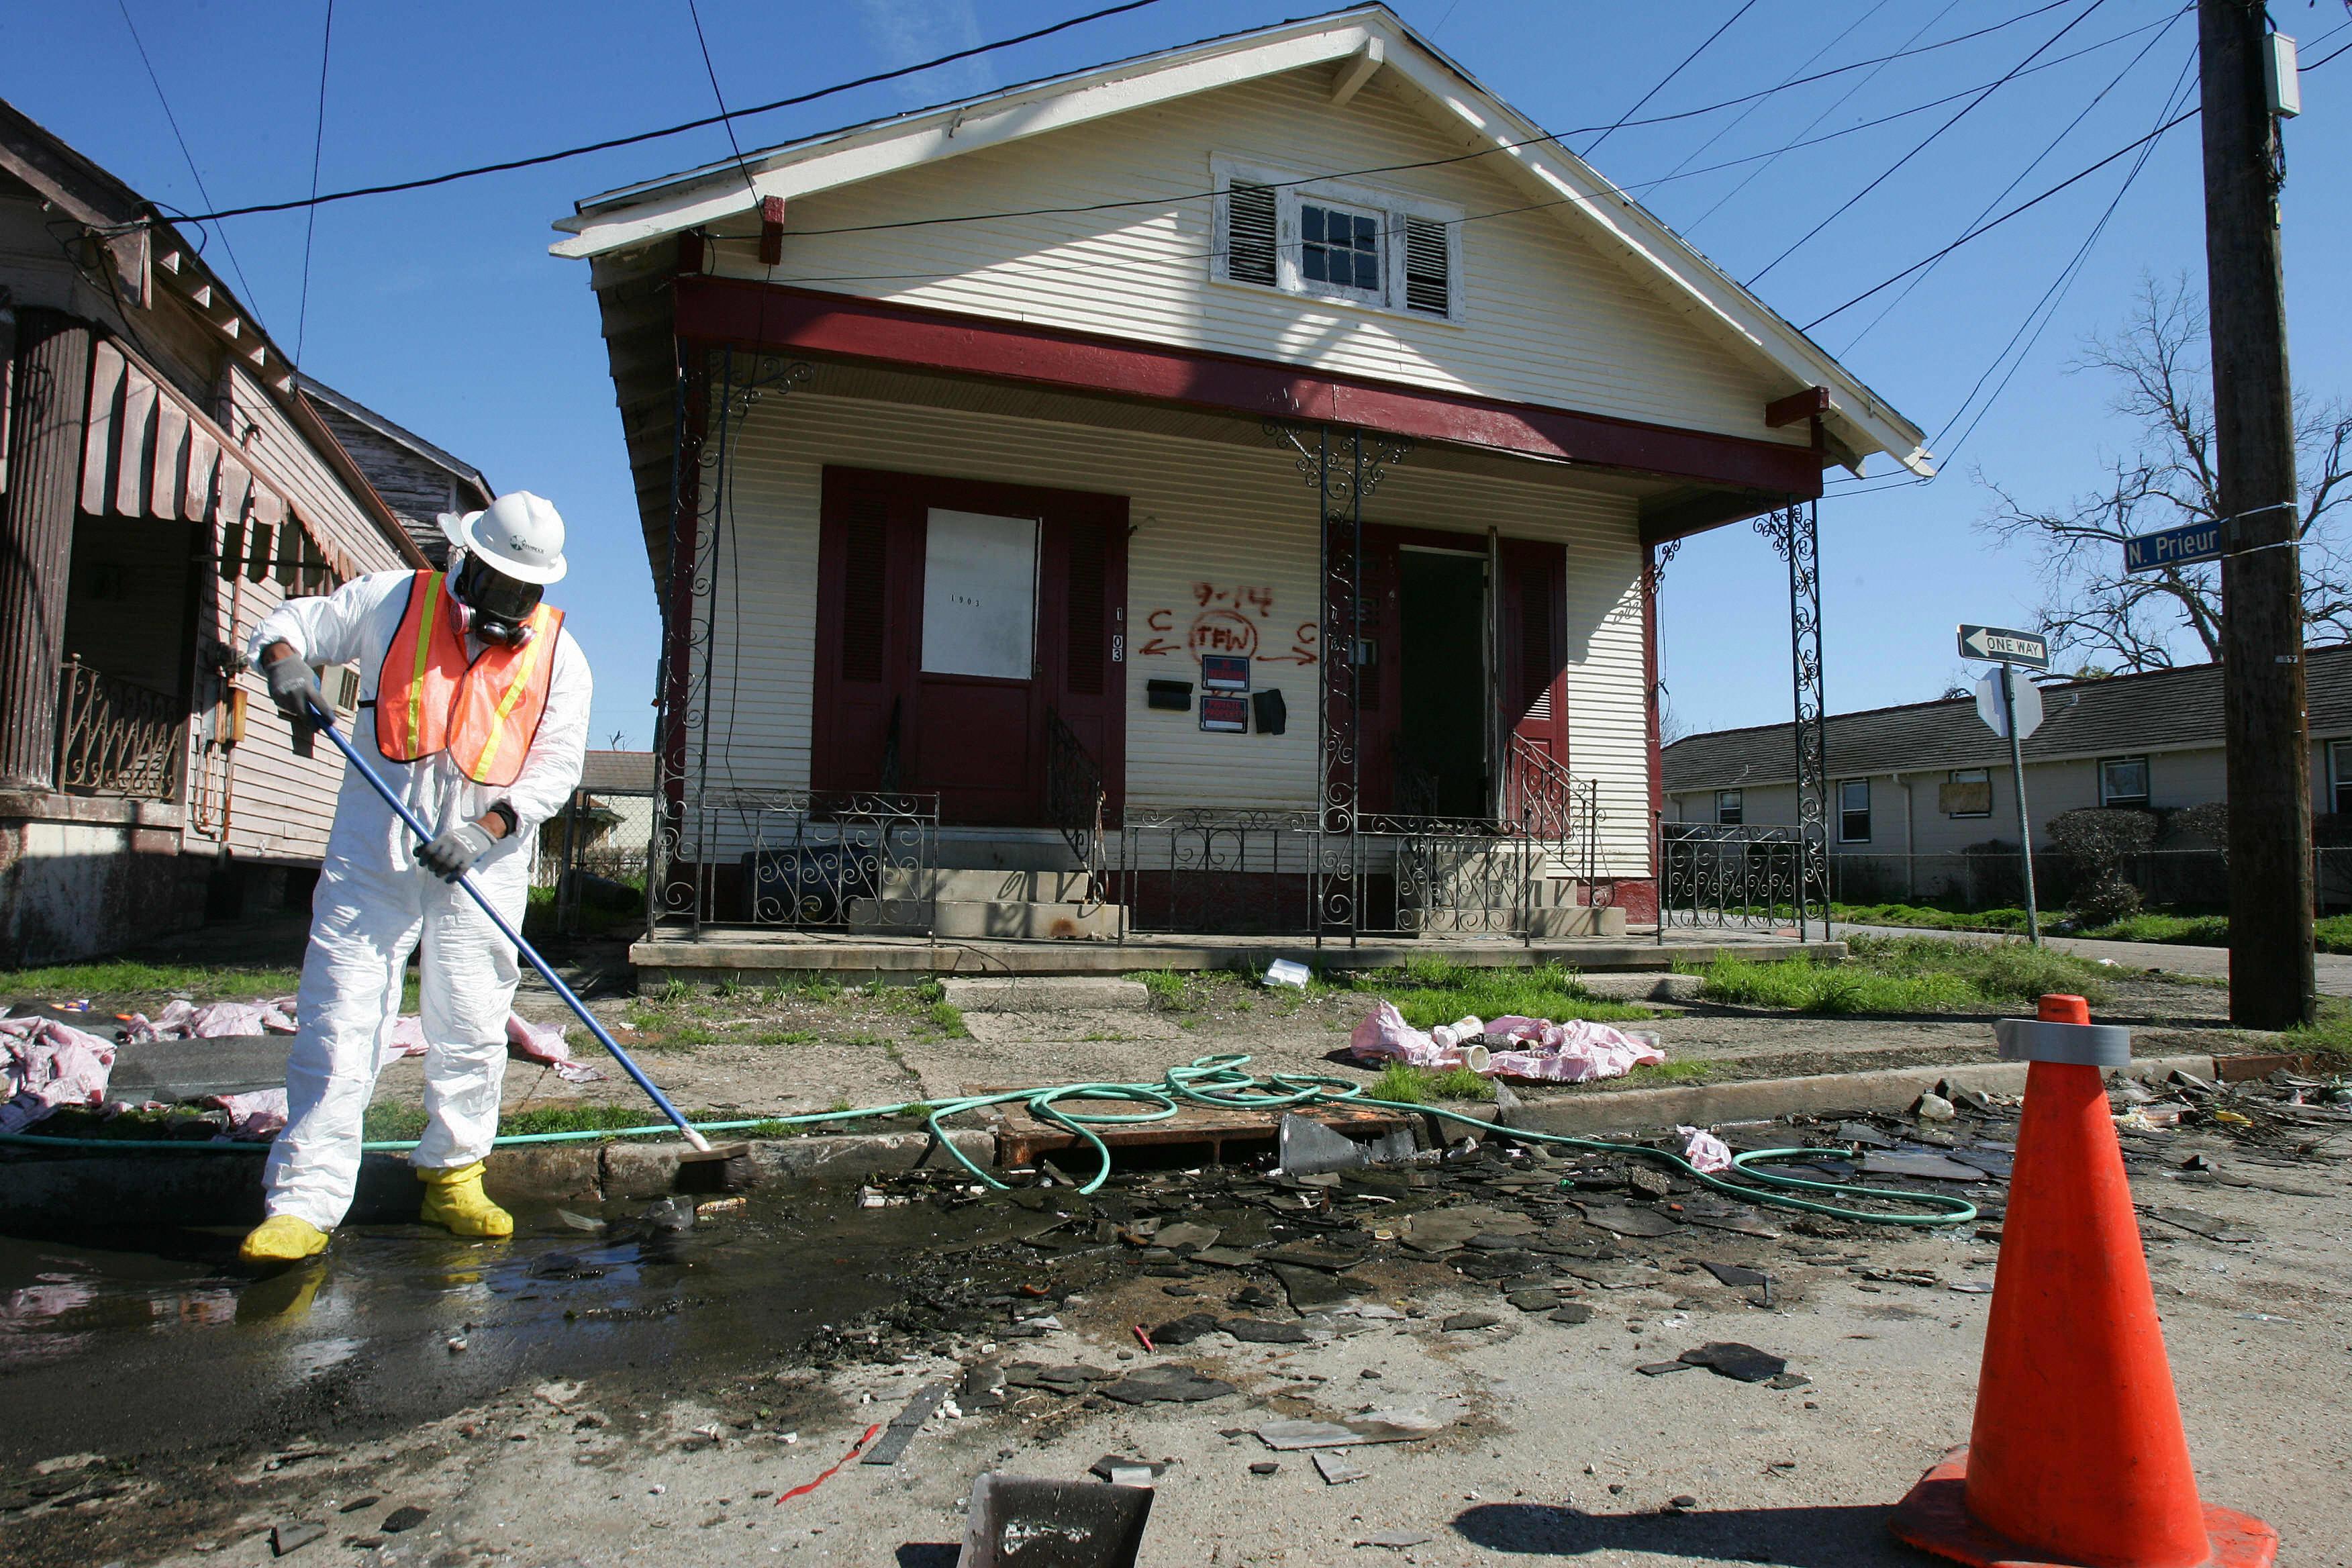 Abestos dangers, asbestos deaths, New Orleans Katrina cleanup 2006